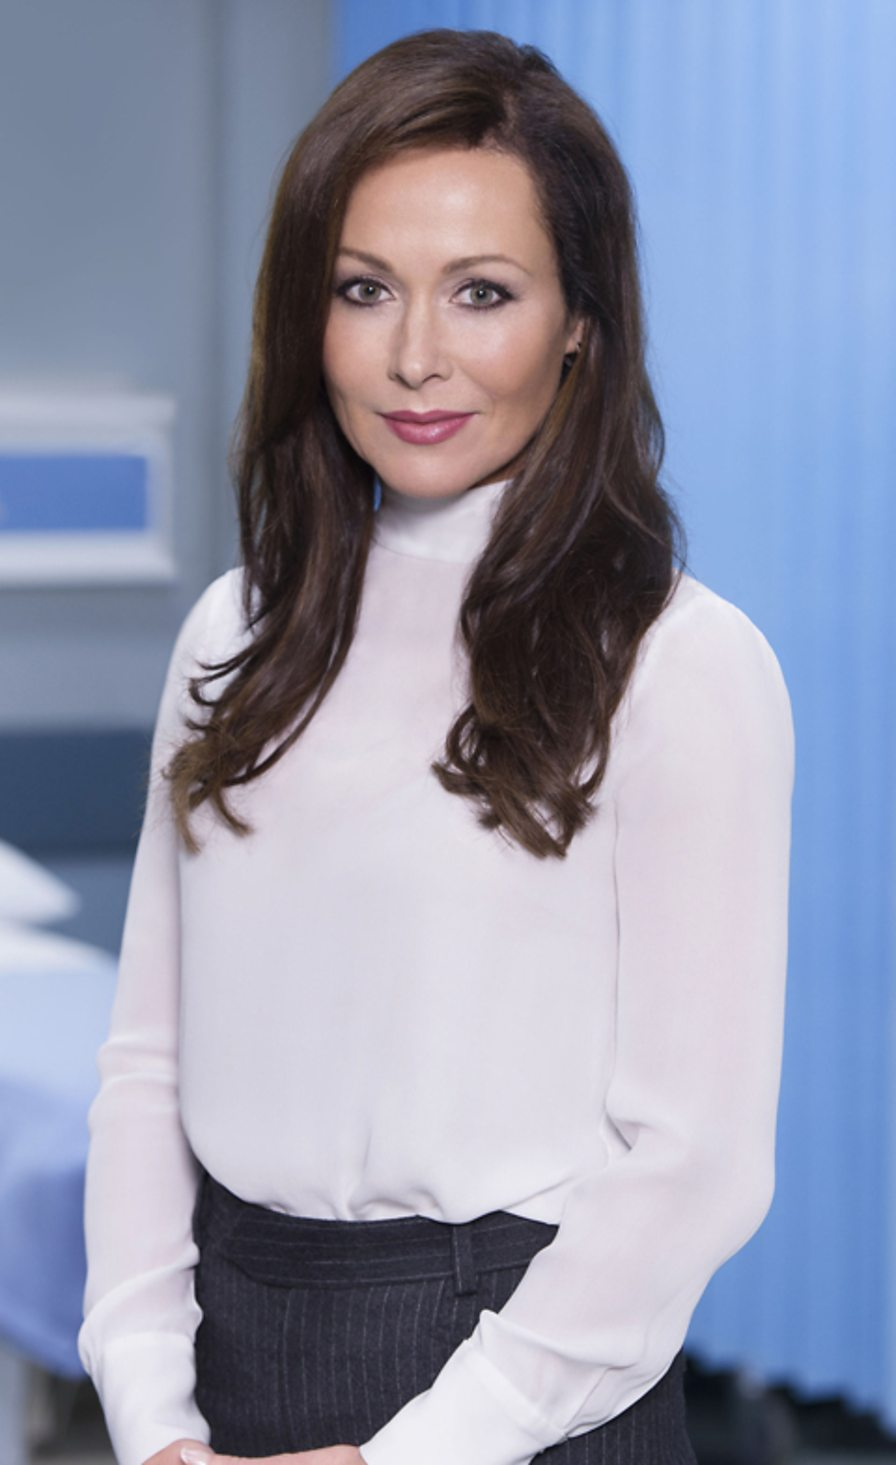 Amanda Mealing Casualty BBC